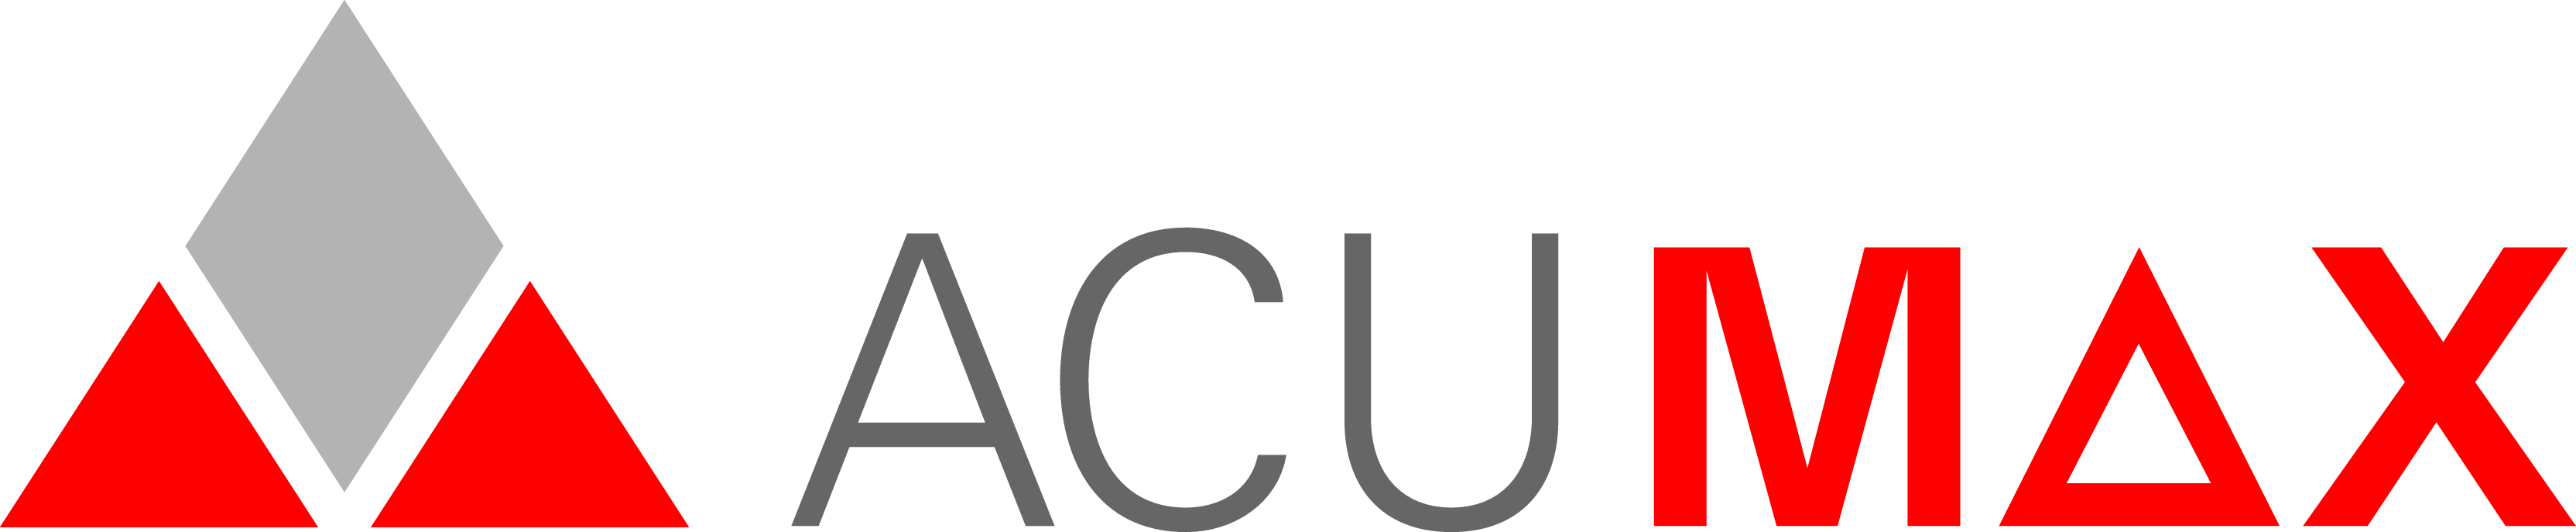 AcuMax Praxisbedarf Schweiz